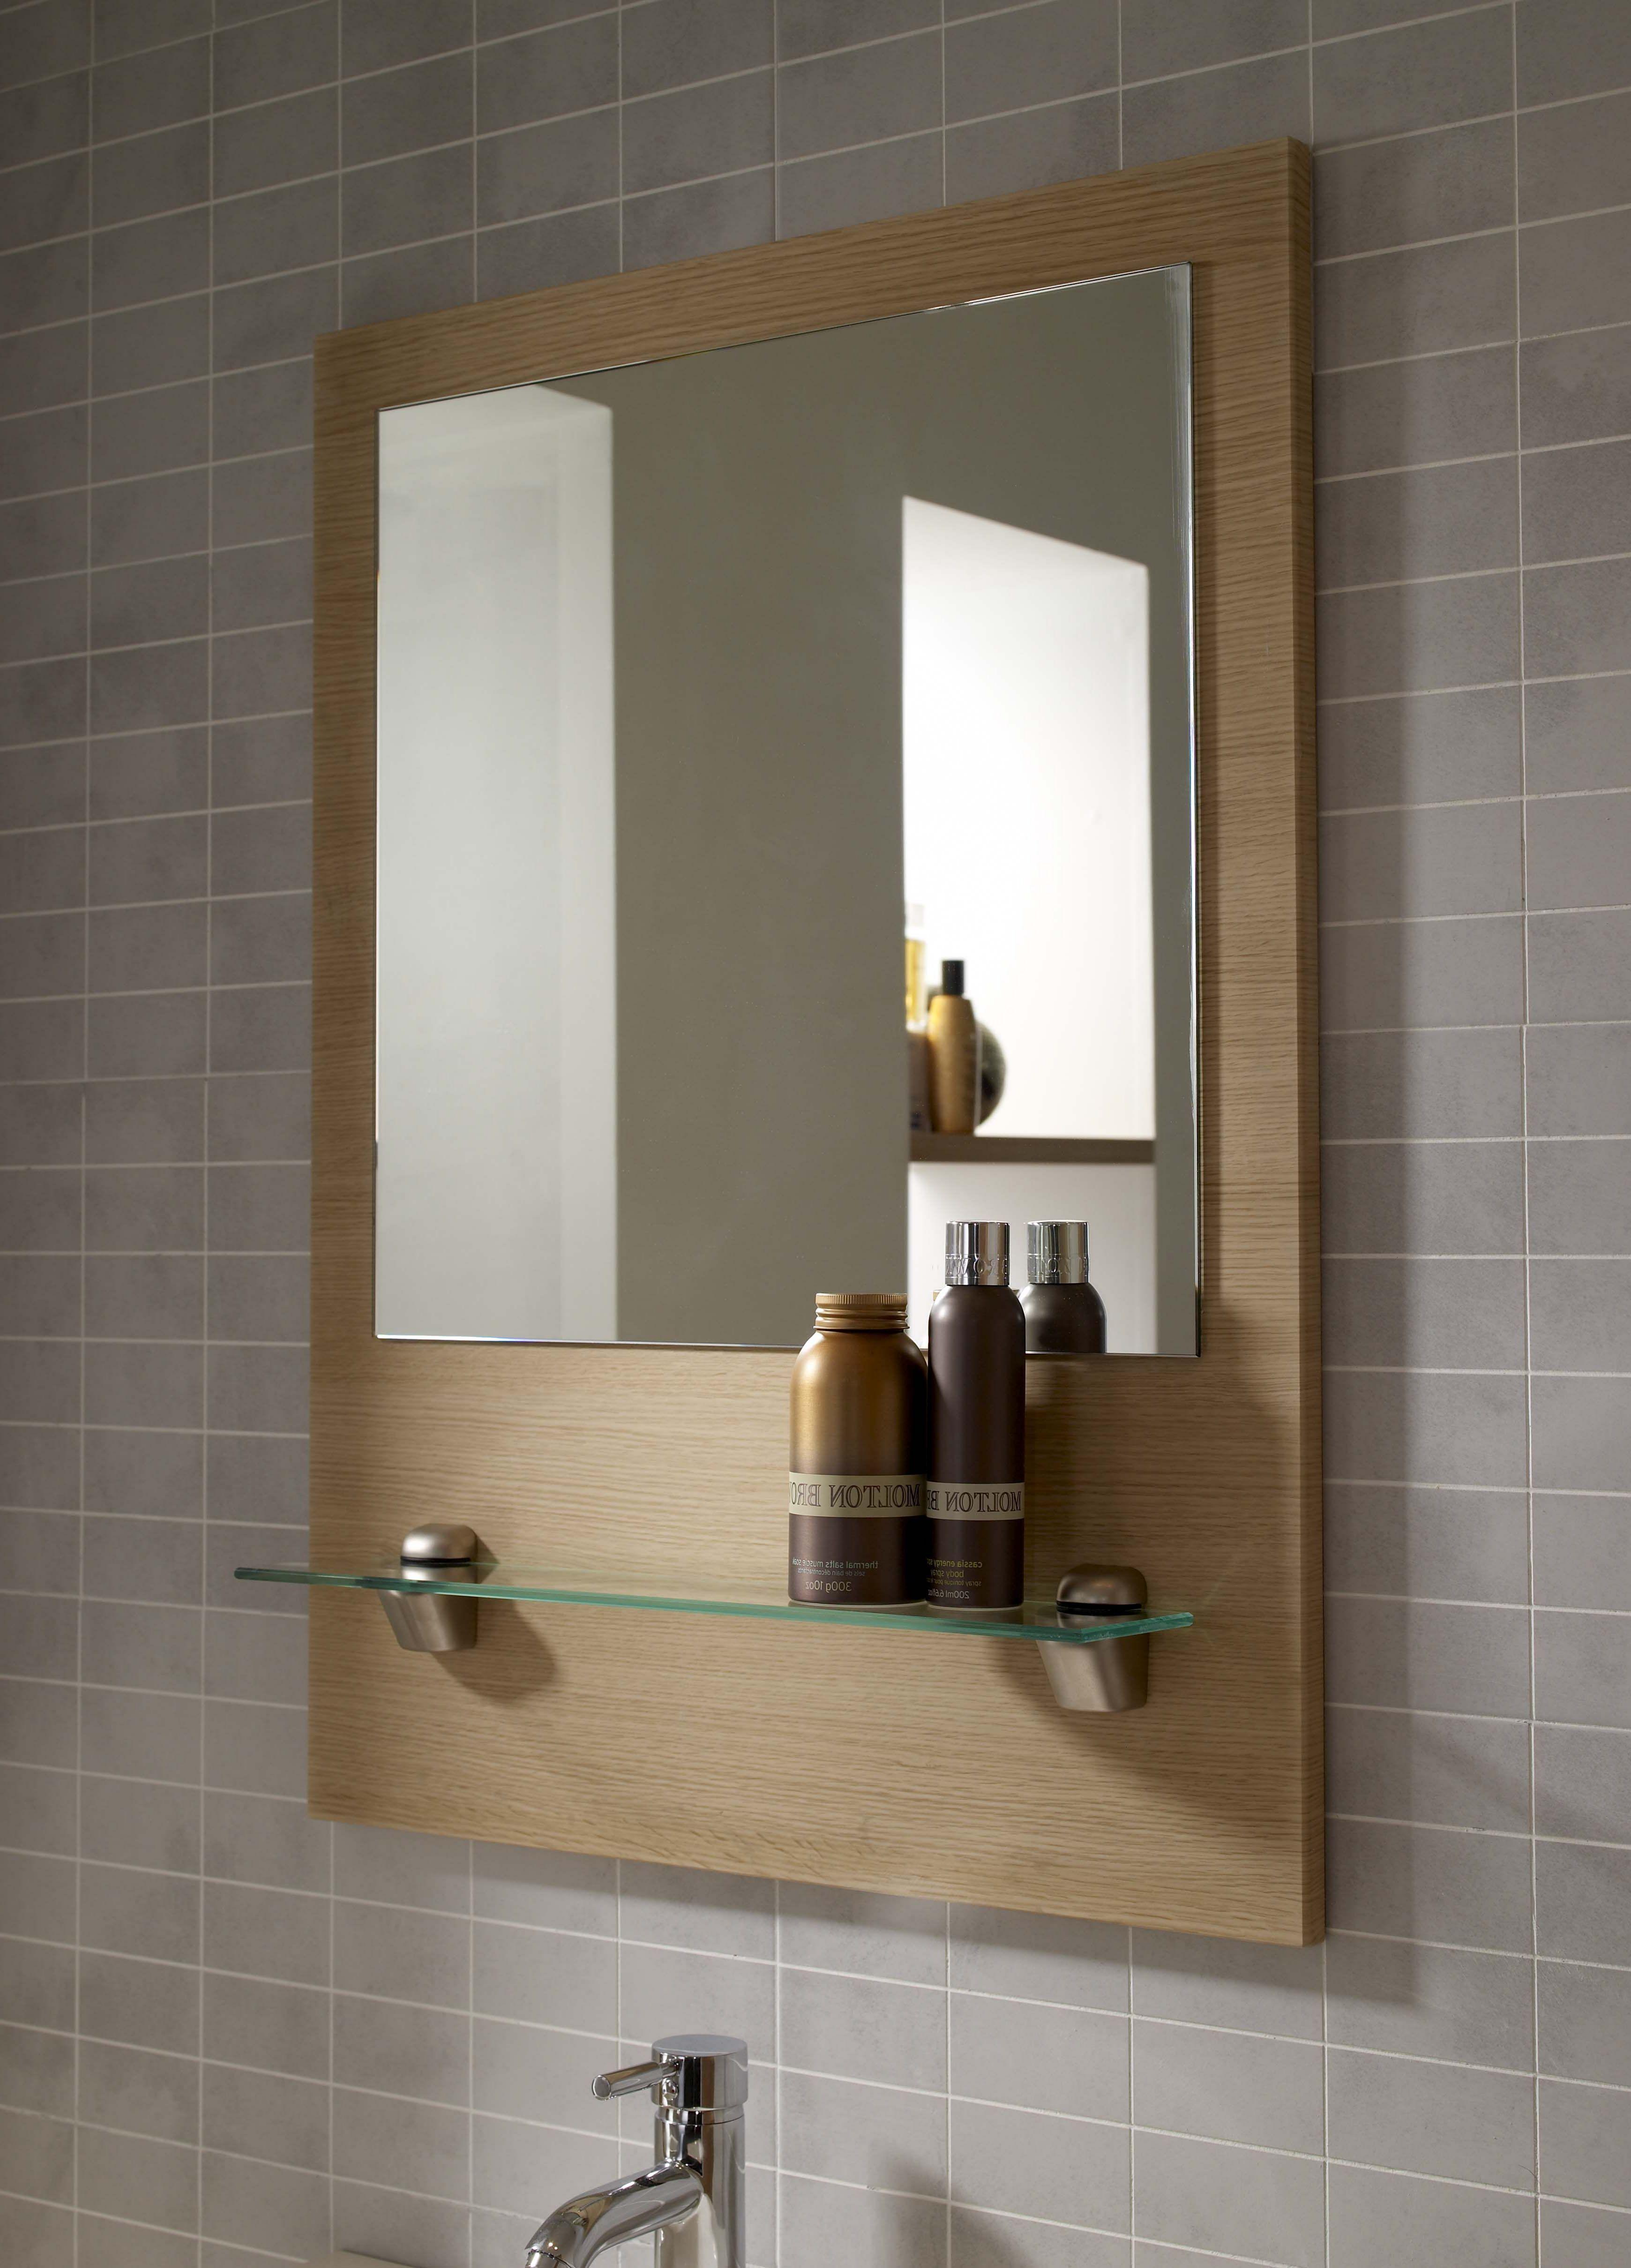 10 Comfortable Bathroom Accessories Ideas To Complete Your Bathroom Design Decorating Bathroom Mirror With Shelf Bathroom Mirror Frame Industrial Bathroom Mirrors [ 4838 x 3480 Pixel ]